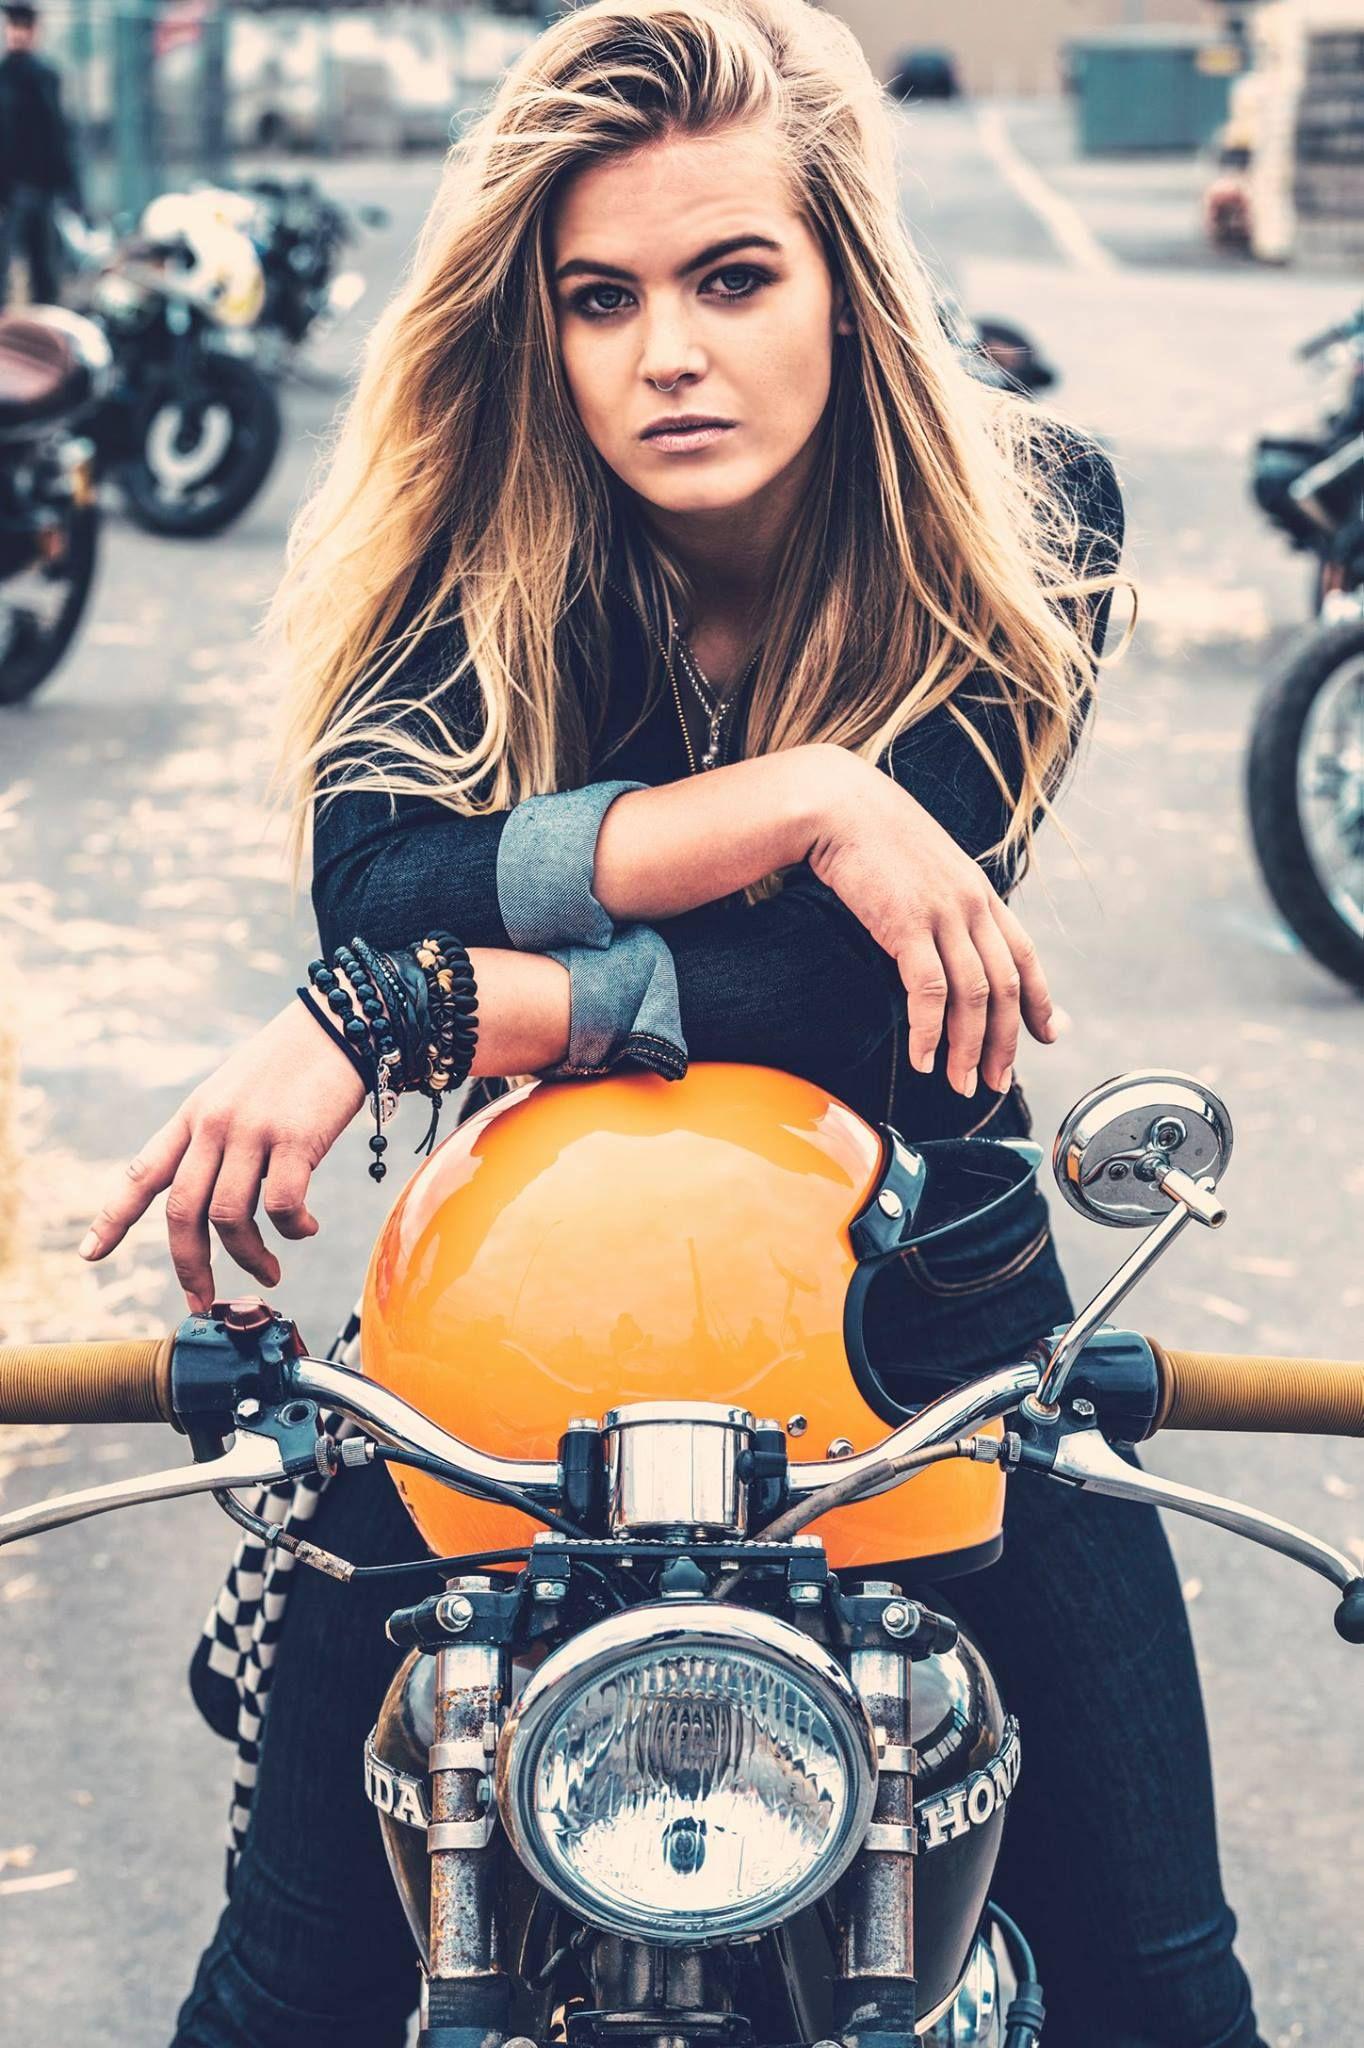 Well Go Anywhere Rumbleon Com Rumbleon Biker Babe Bikerbabe Female Motorcycle Femme Blonde